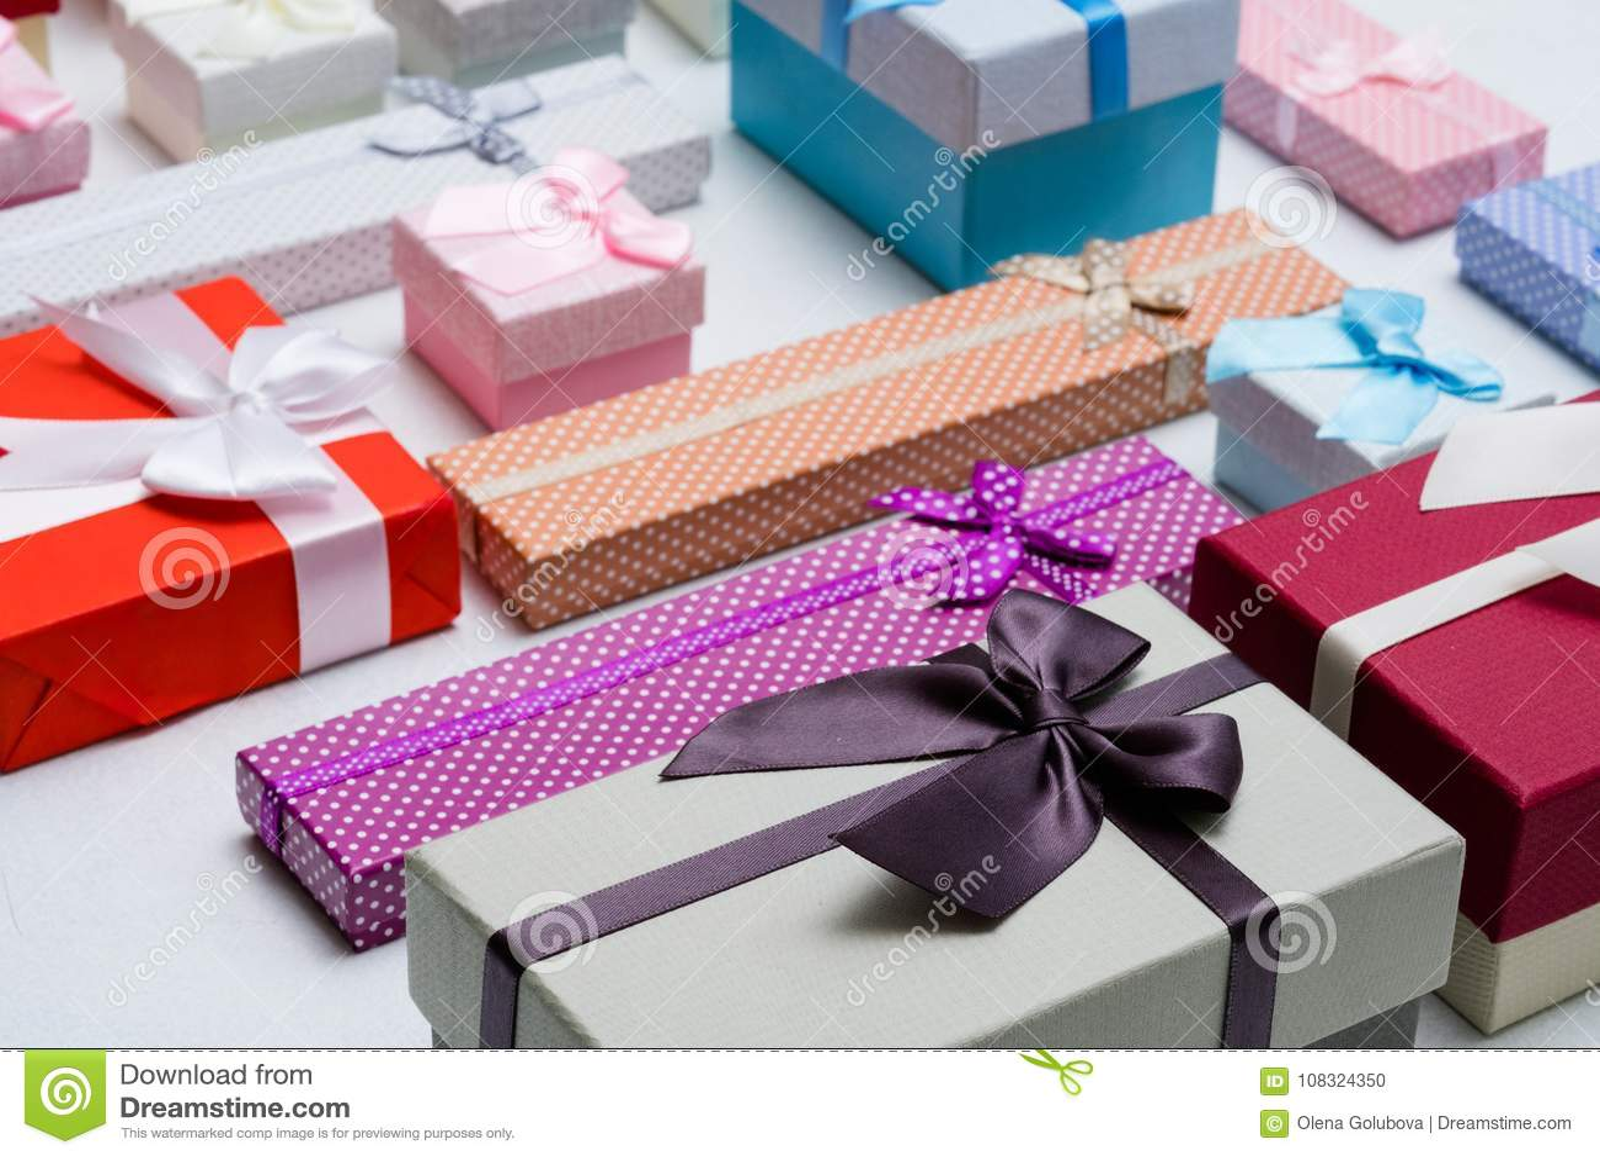 Present Wrapping Craft Creative Idea Boxes Design Stock Photo